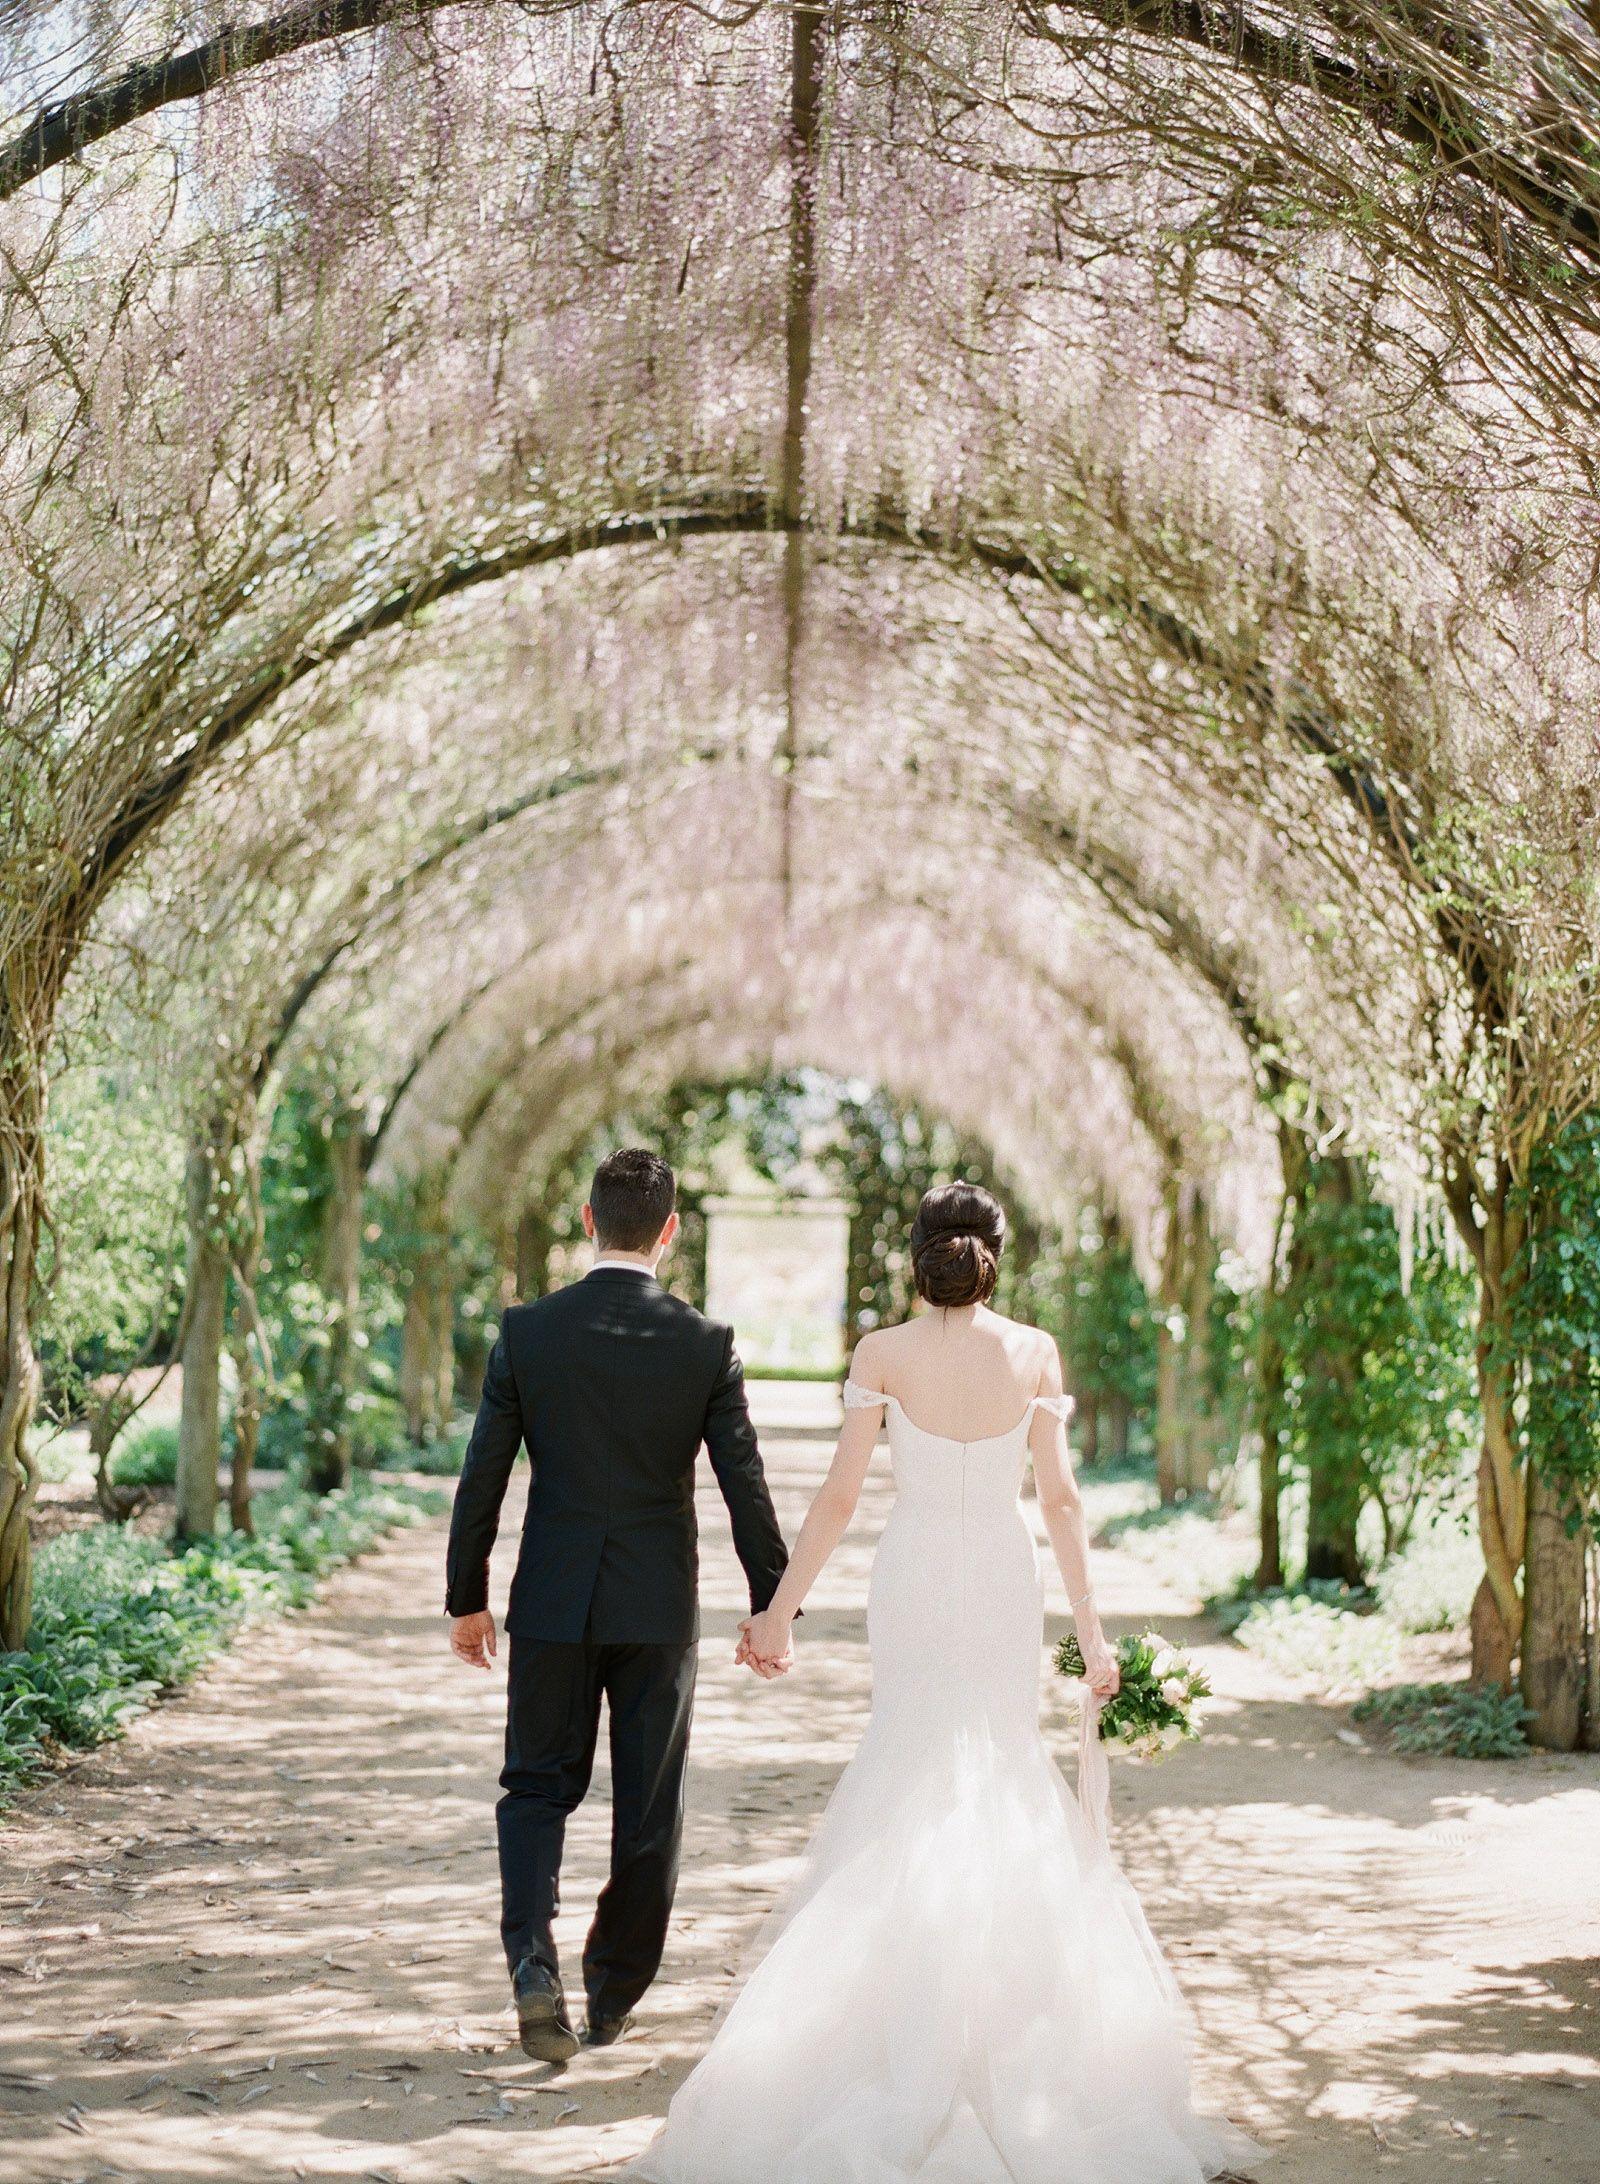 Cheap wedding dresses sydney online dating